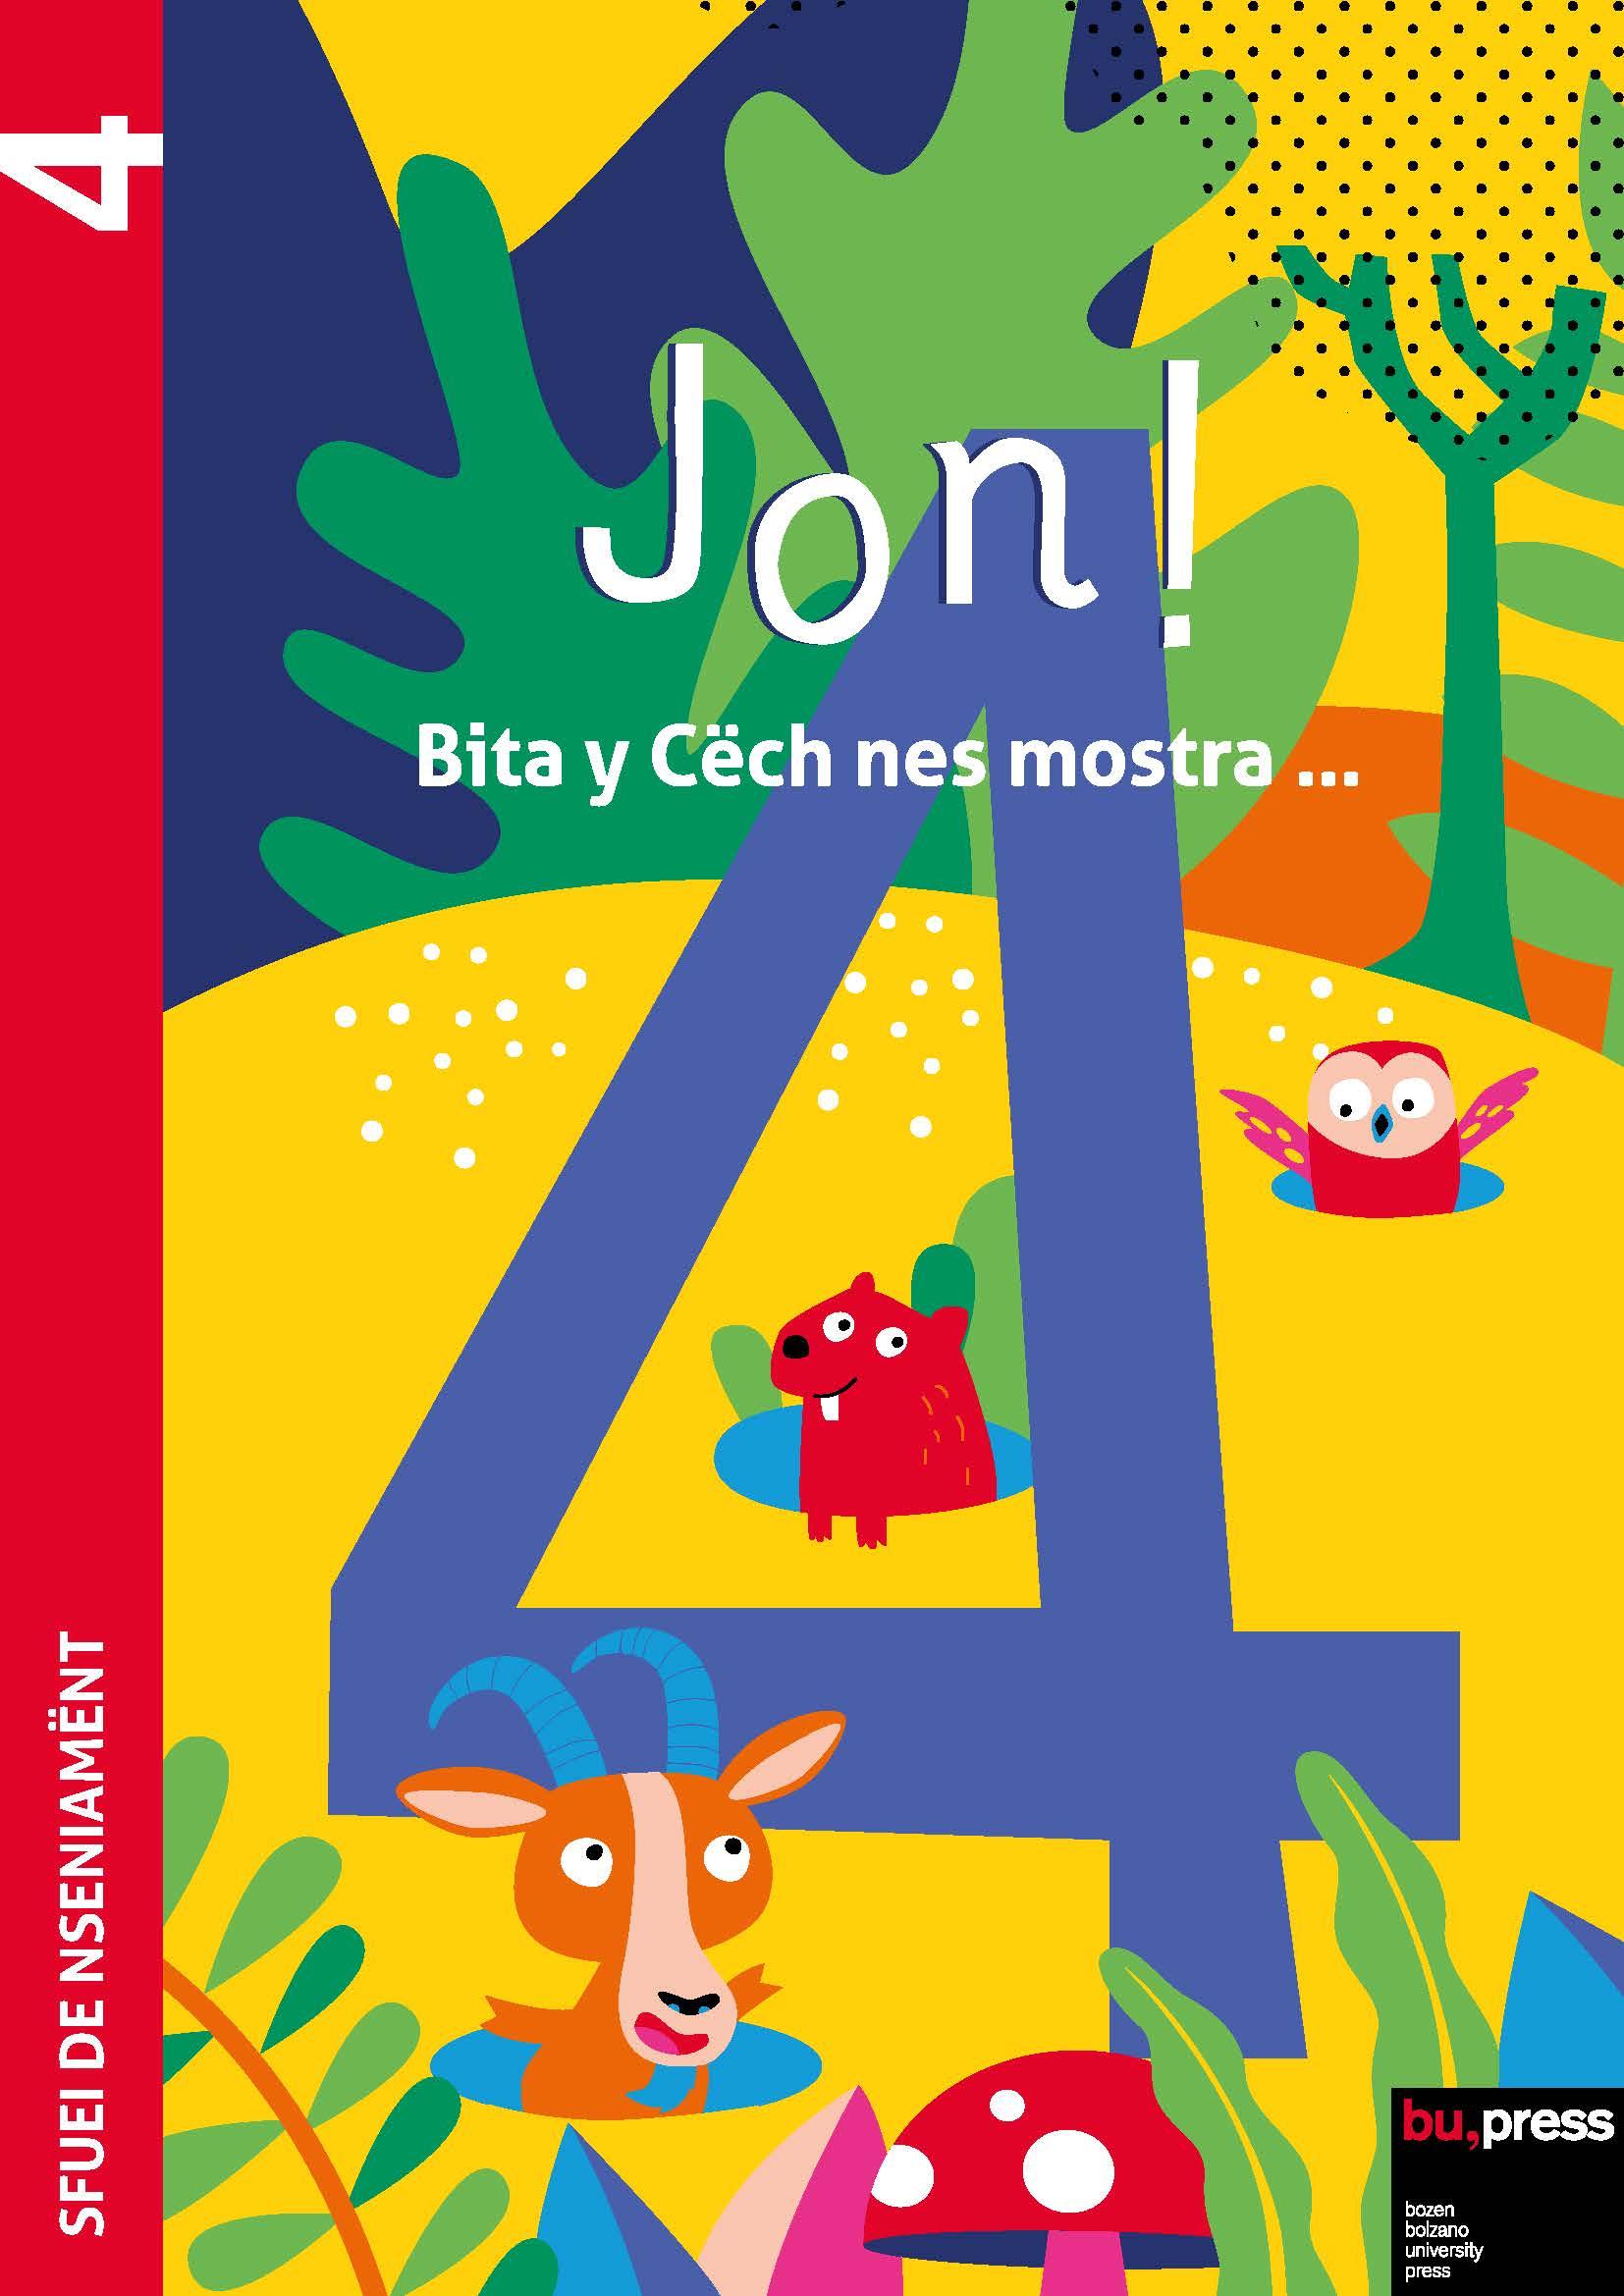 Cover of Jon! 4 – Sfuei de nseniamënt